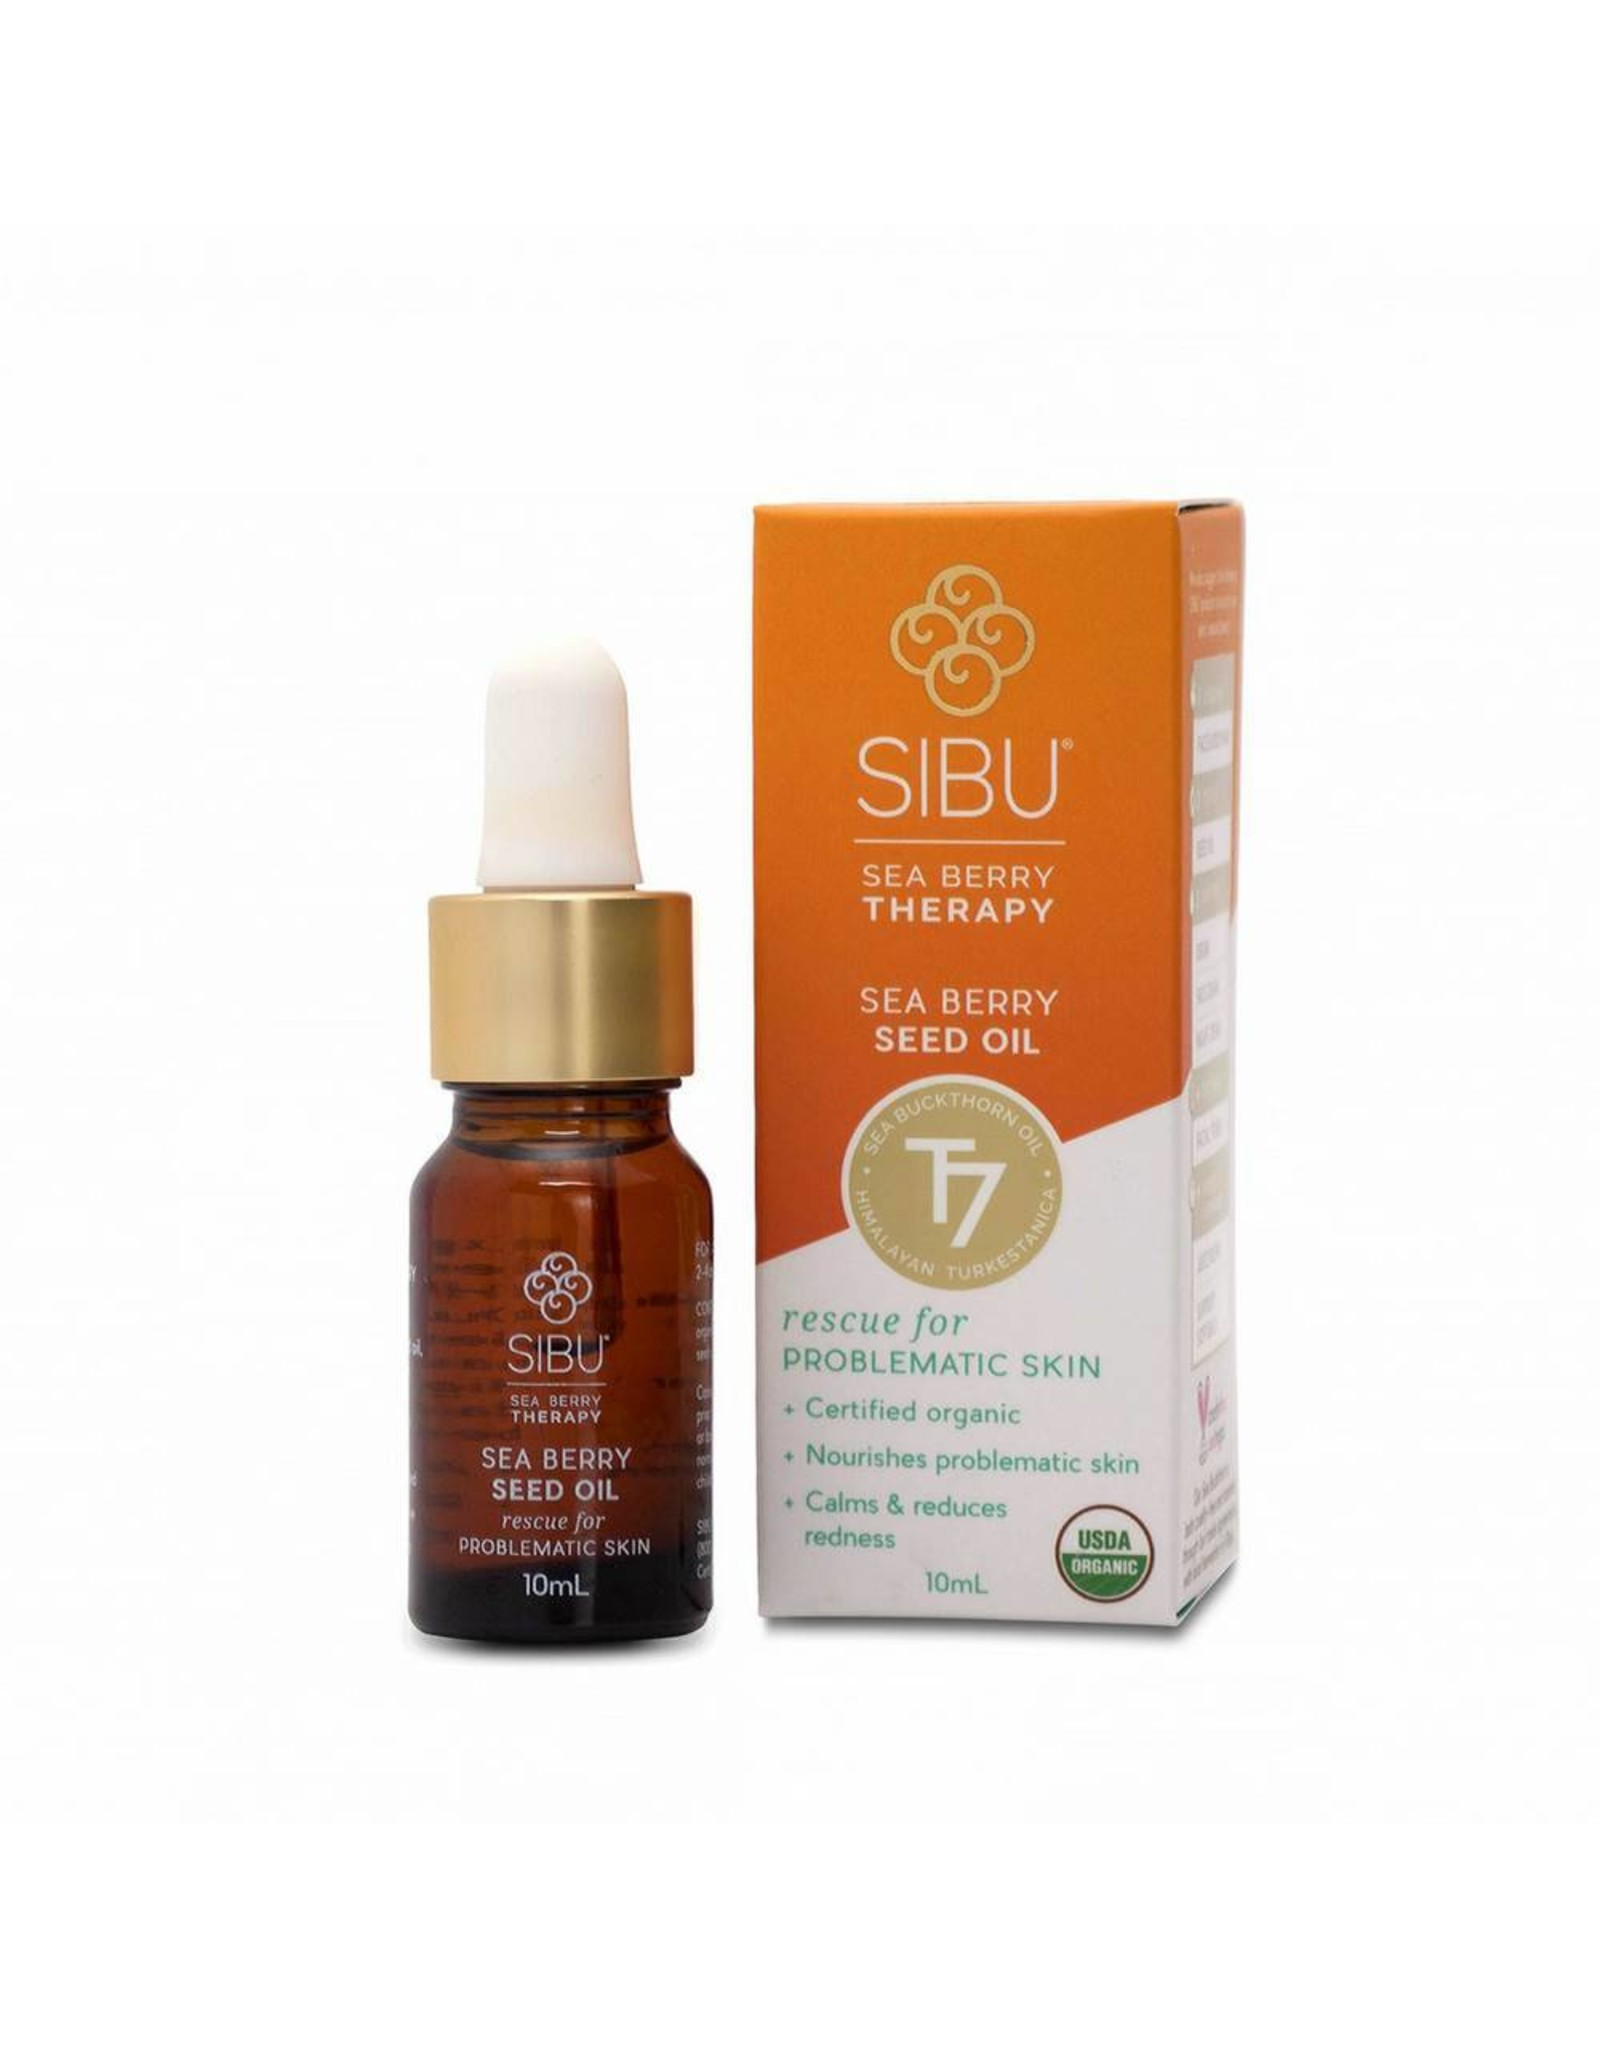 sibu™ Seed Oil - Sea Buckthorn Seed 10mL